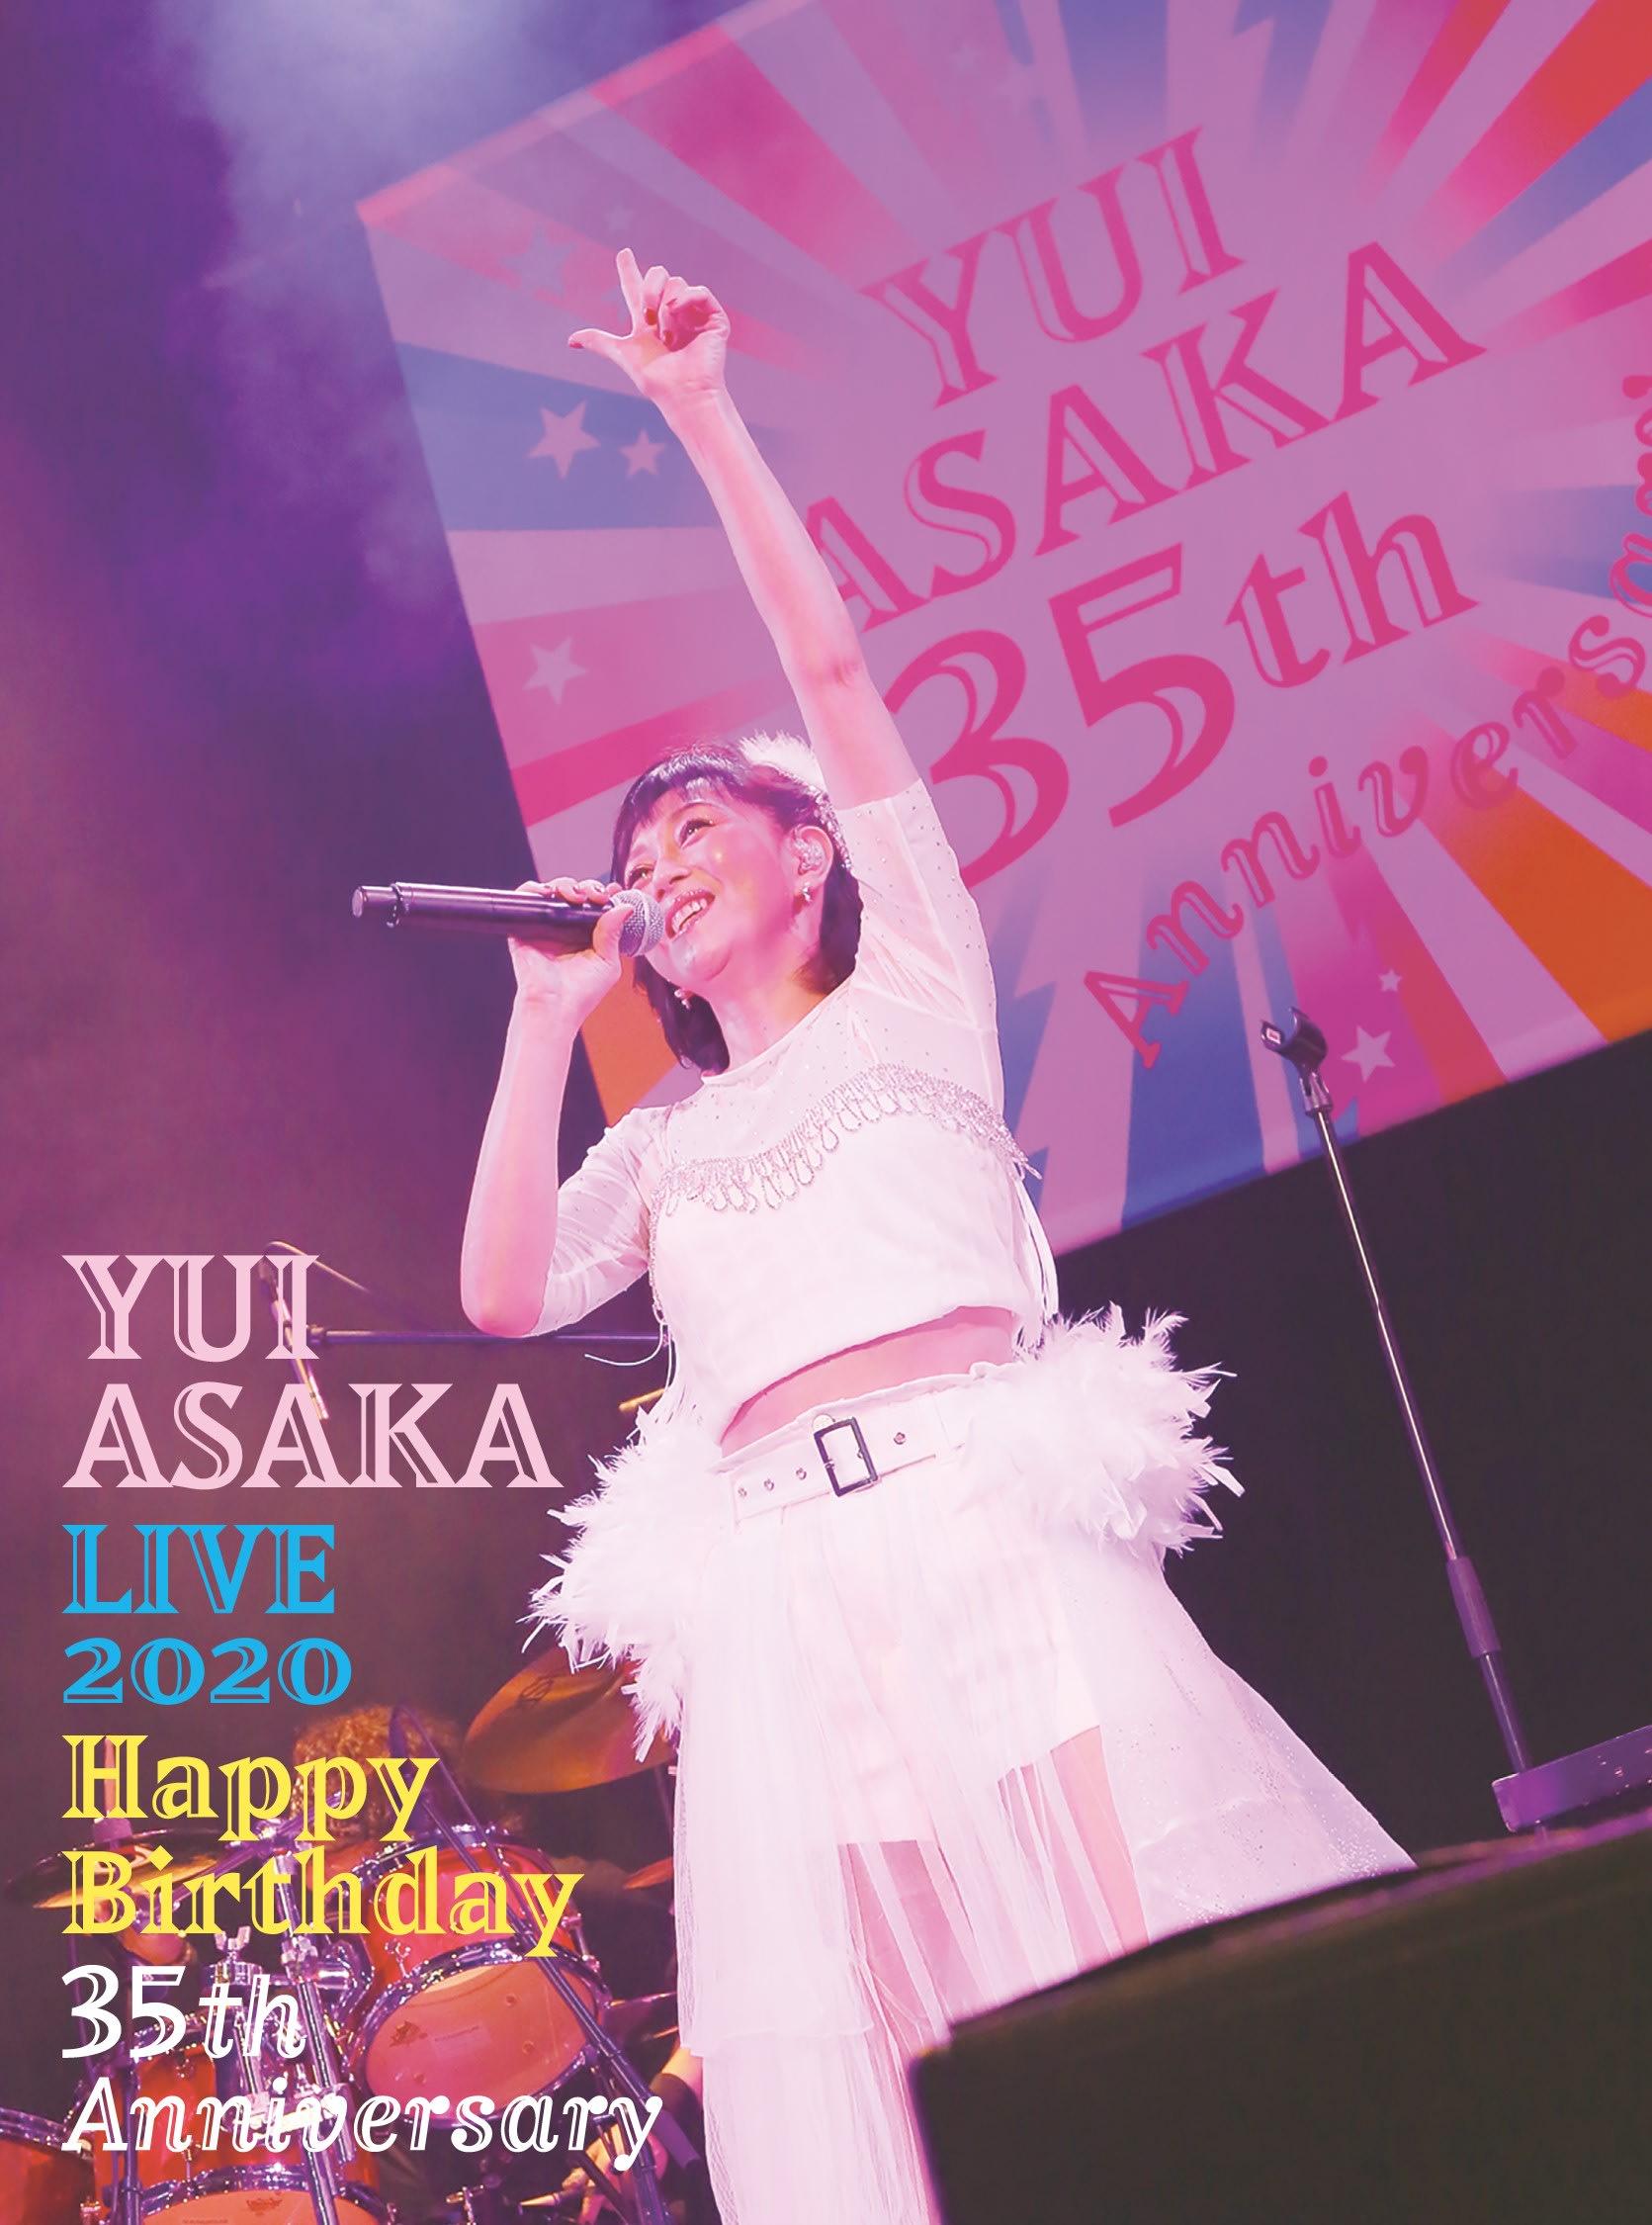 YUI ASAKA LIVE 2020~Happy Birthday 35th Anniversary【完全生産限定3枚組BOX】の画像